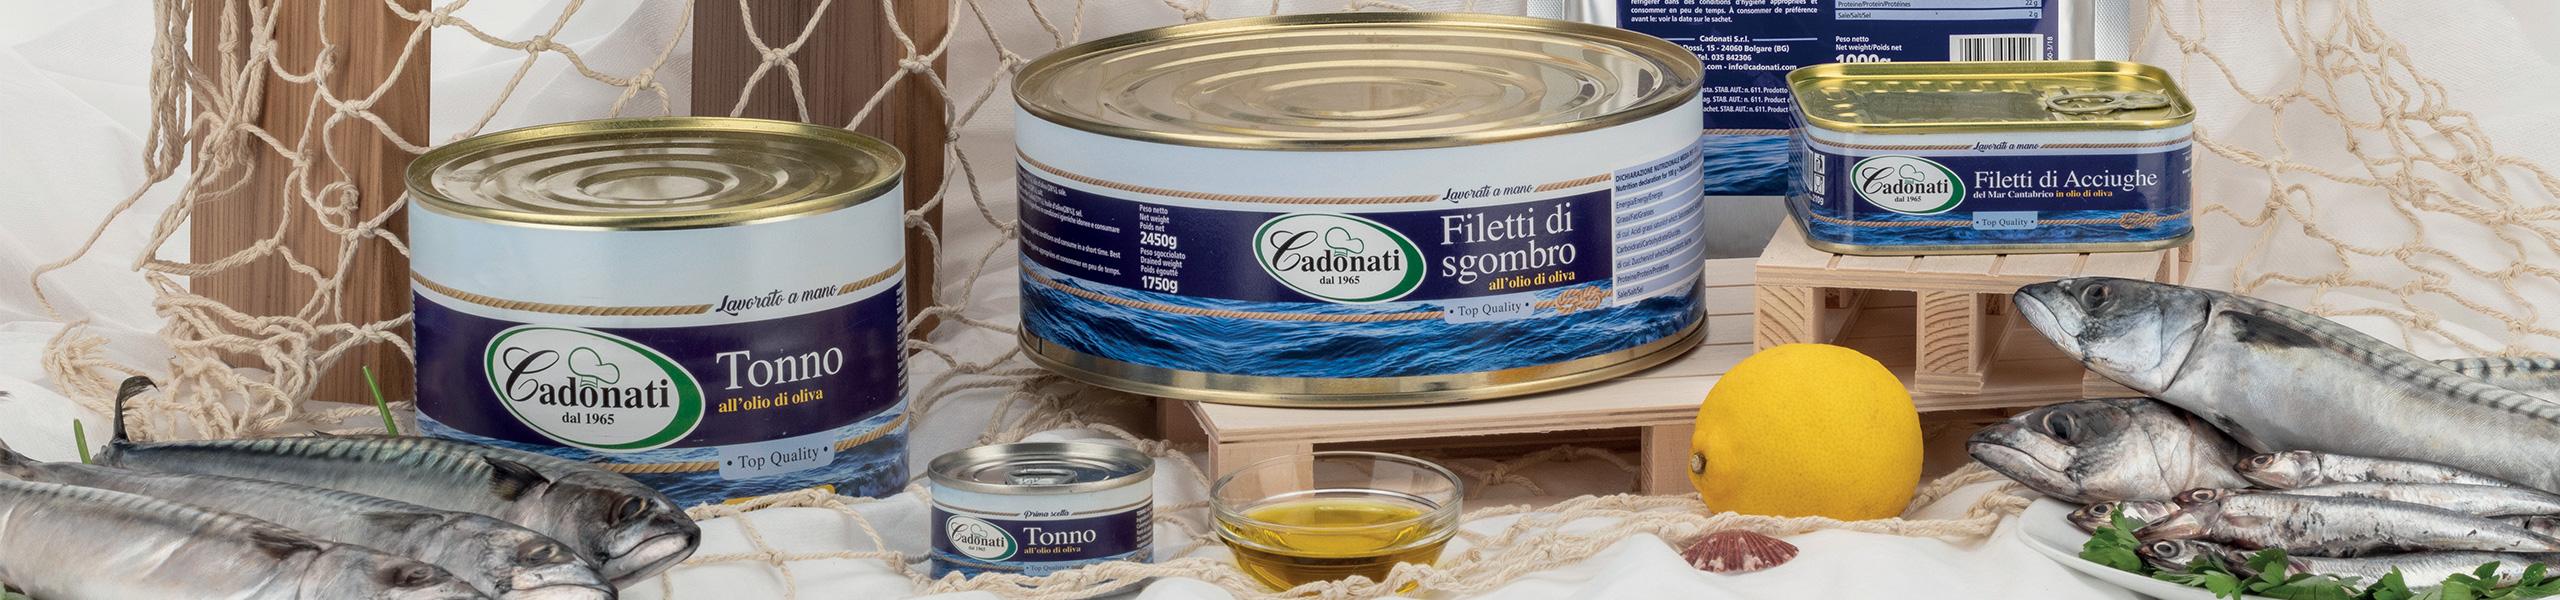 Tonno all'olio d'oliva Prima Scelta